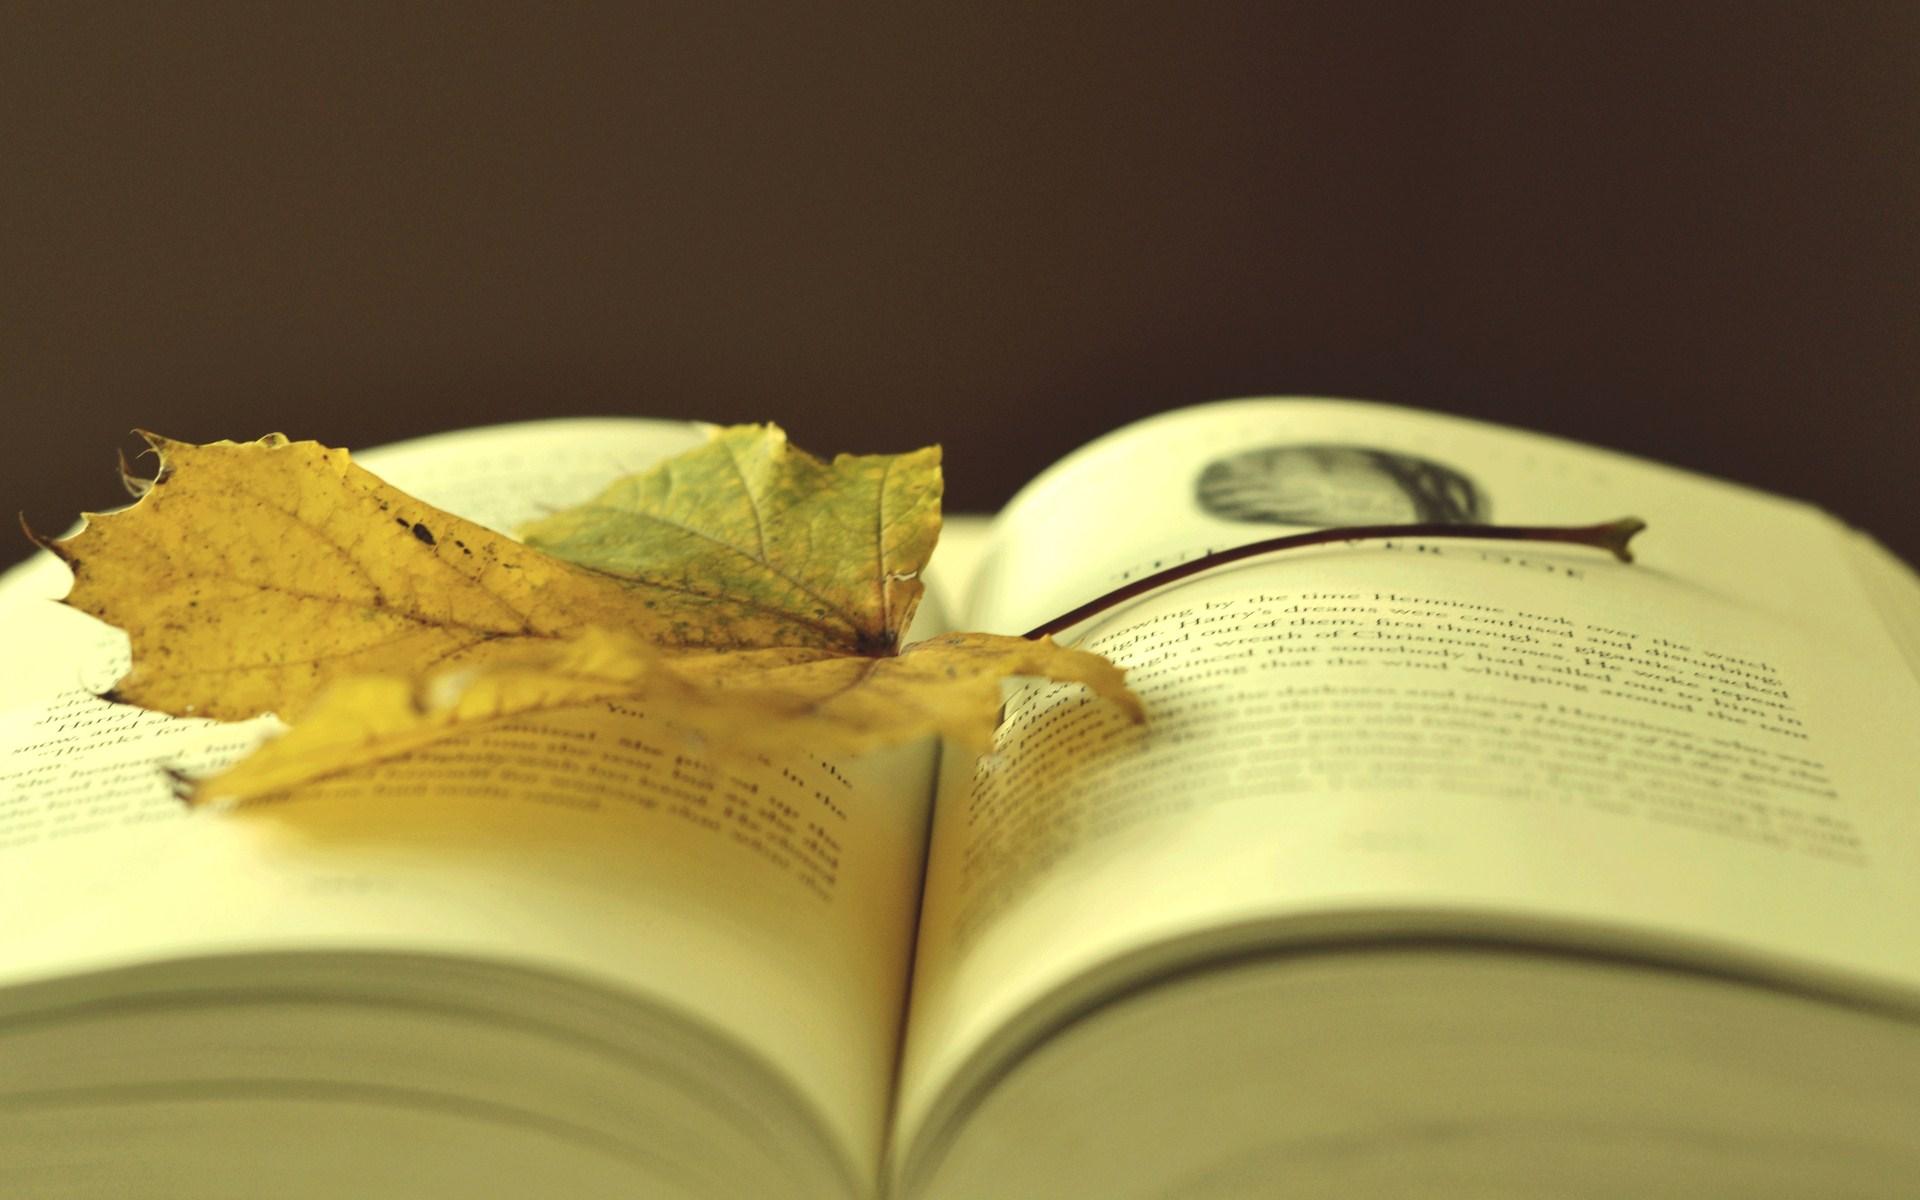 Yellow Leaf Book Autumn Photo HD Wallpaper